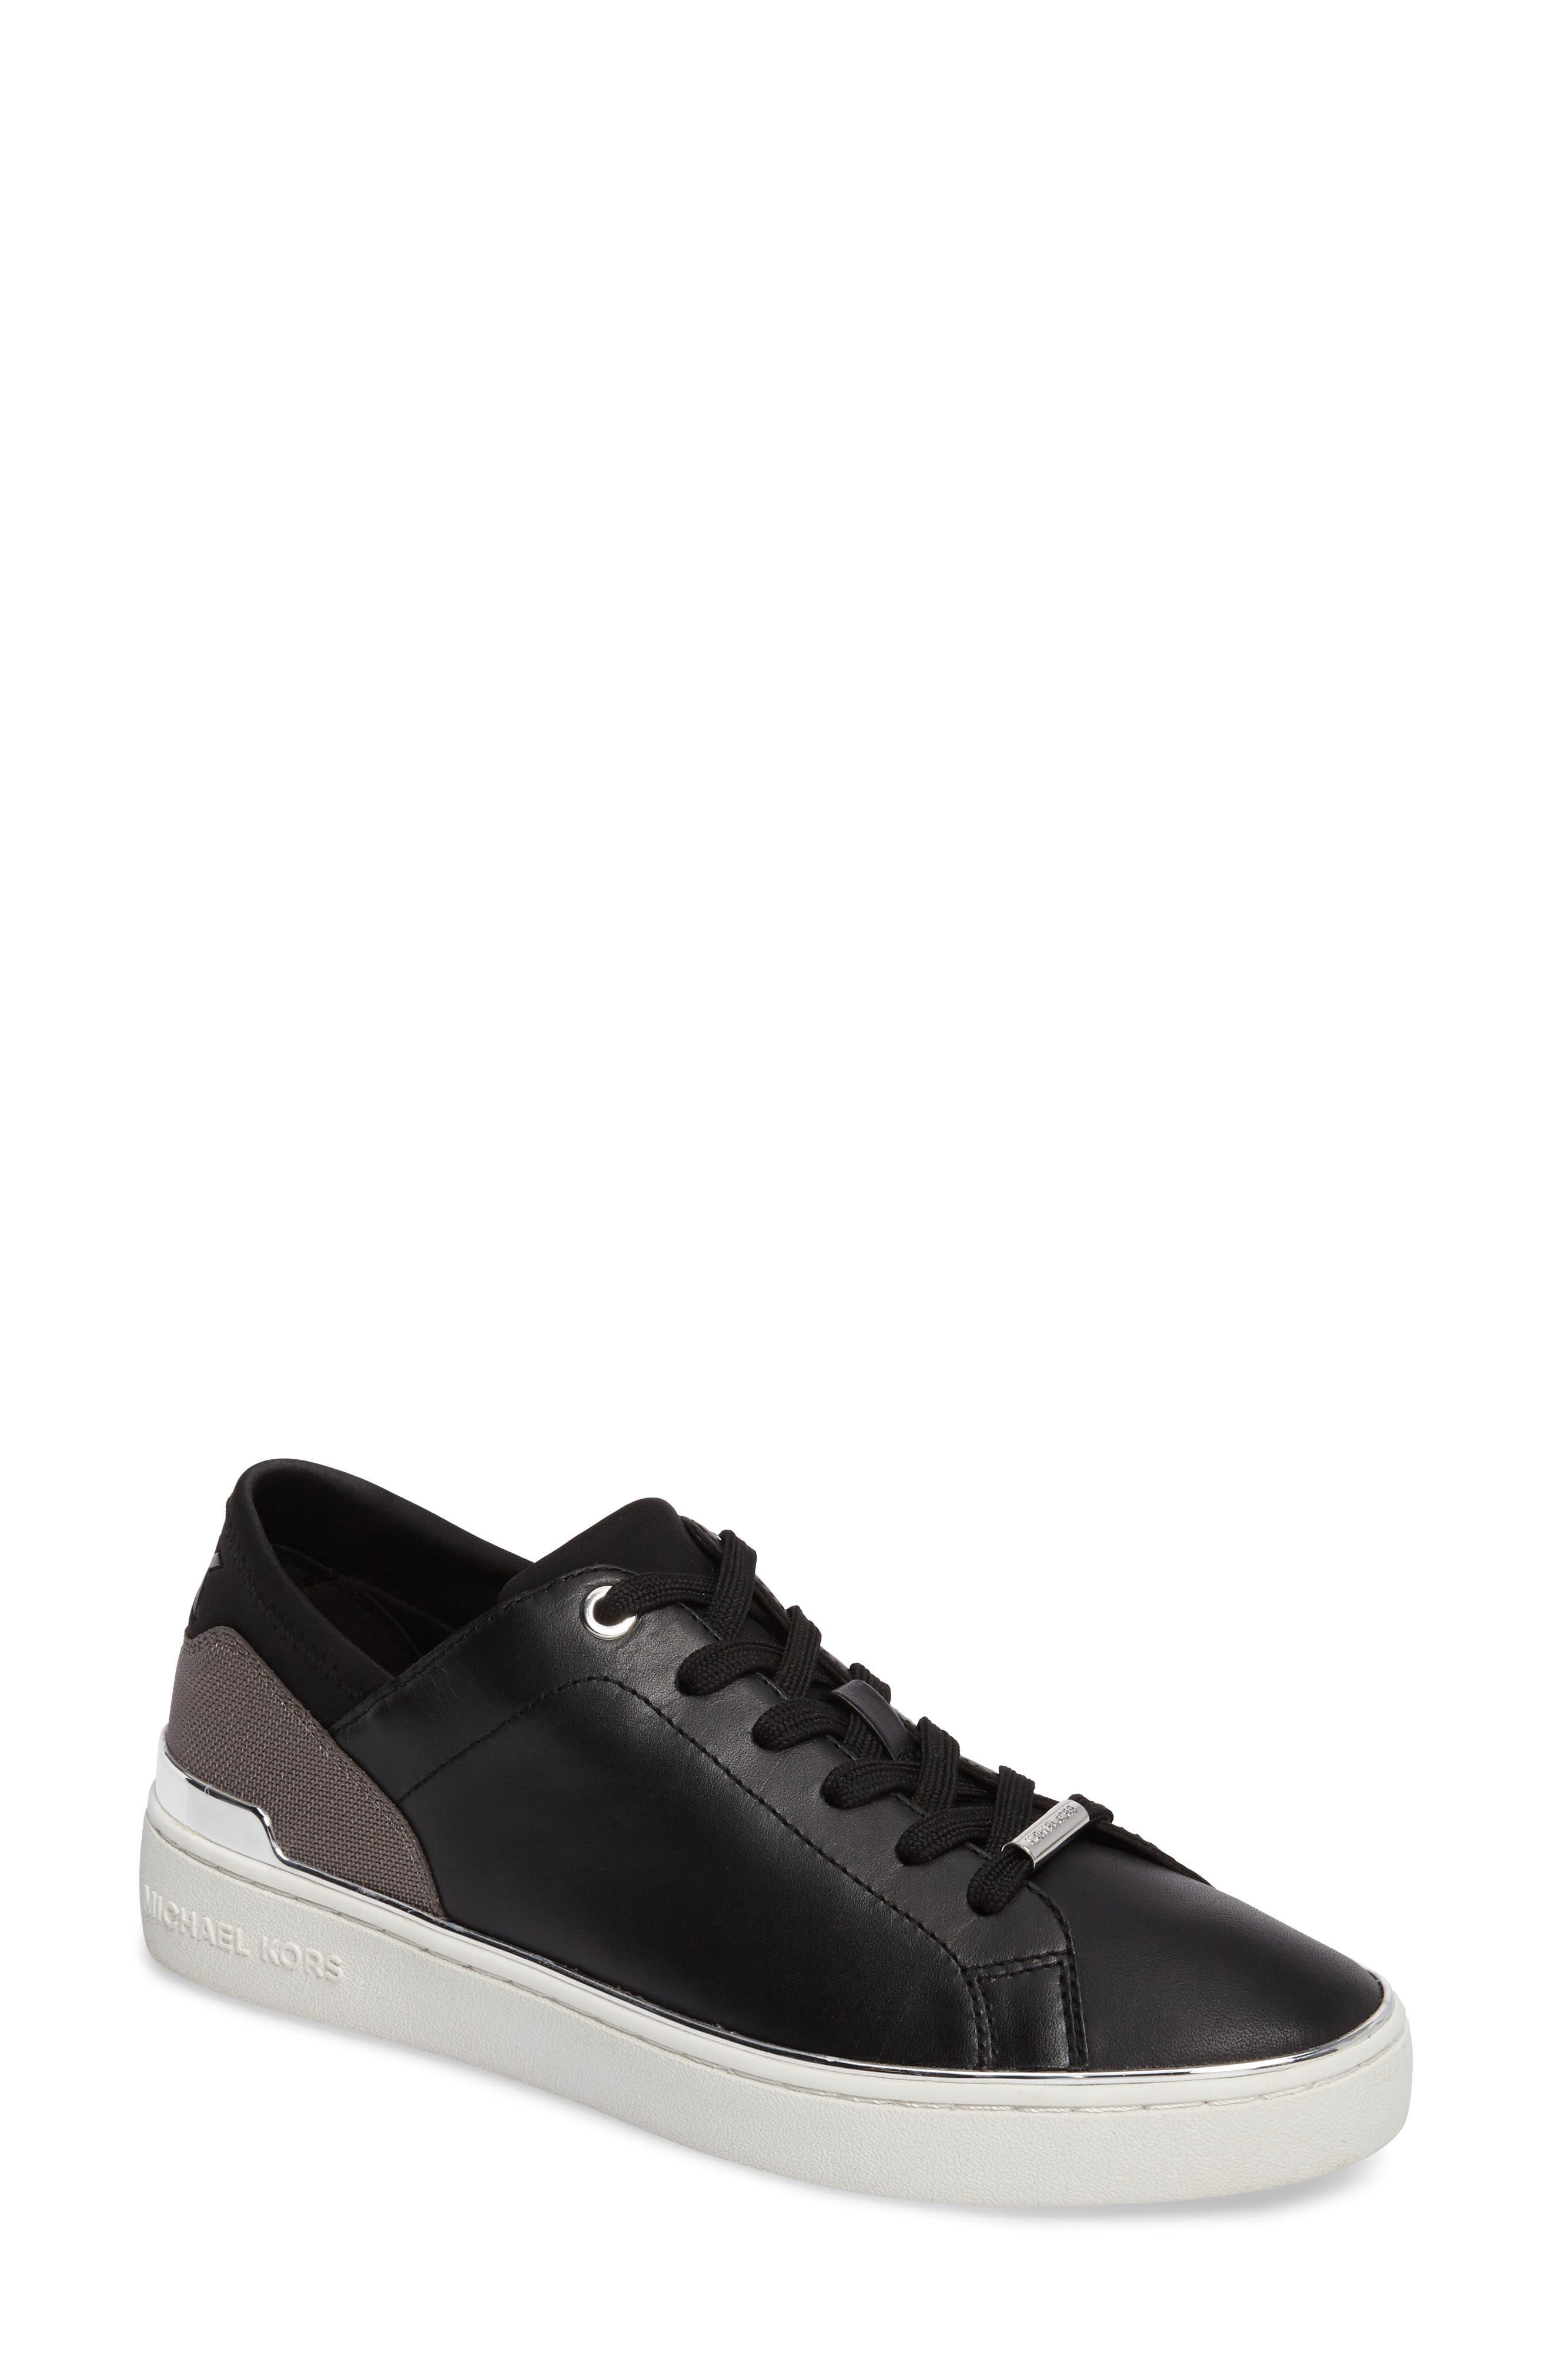 Scout Sneaker,                             Main thumbnail 1, color,                             002